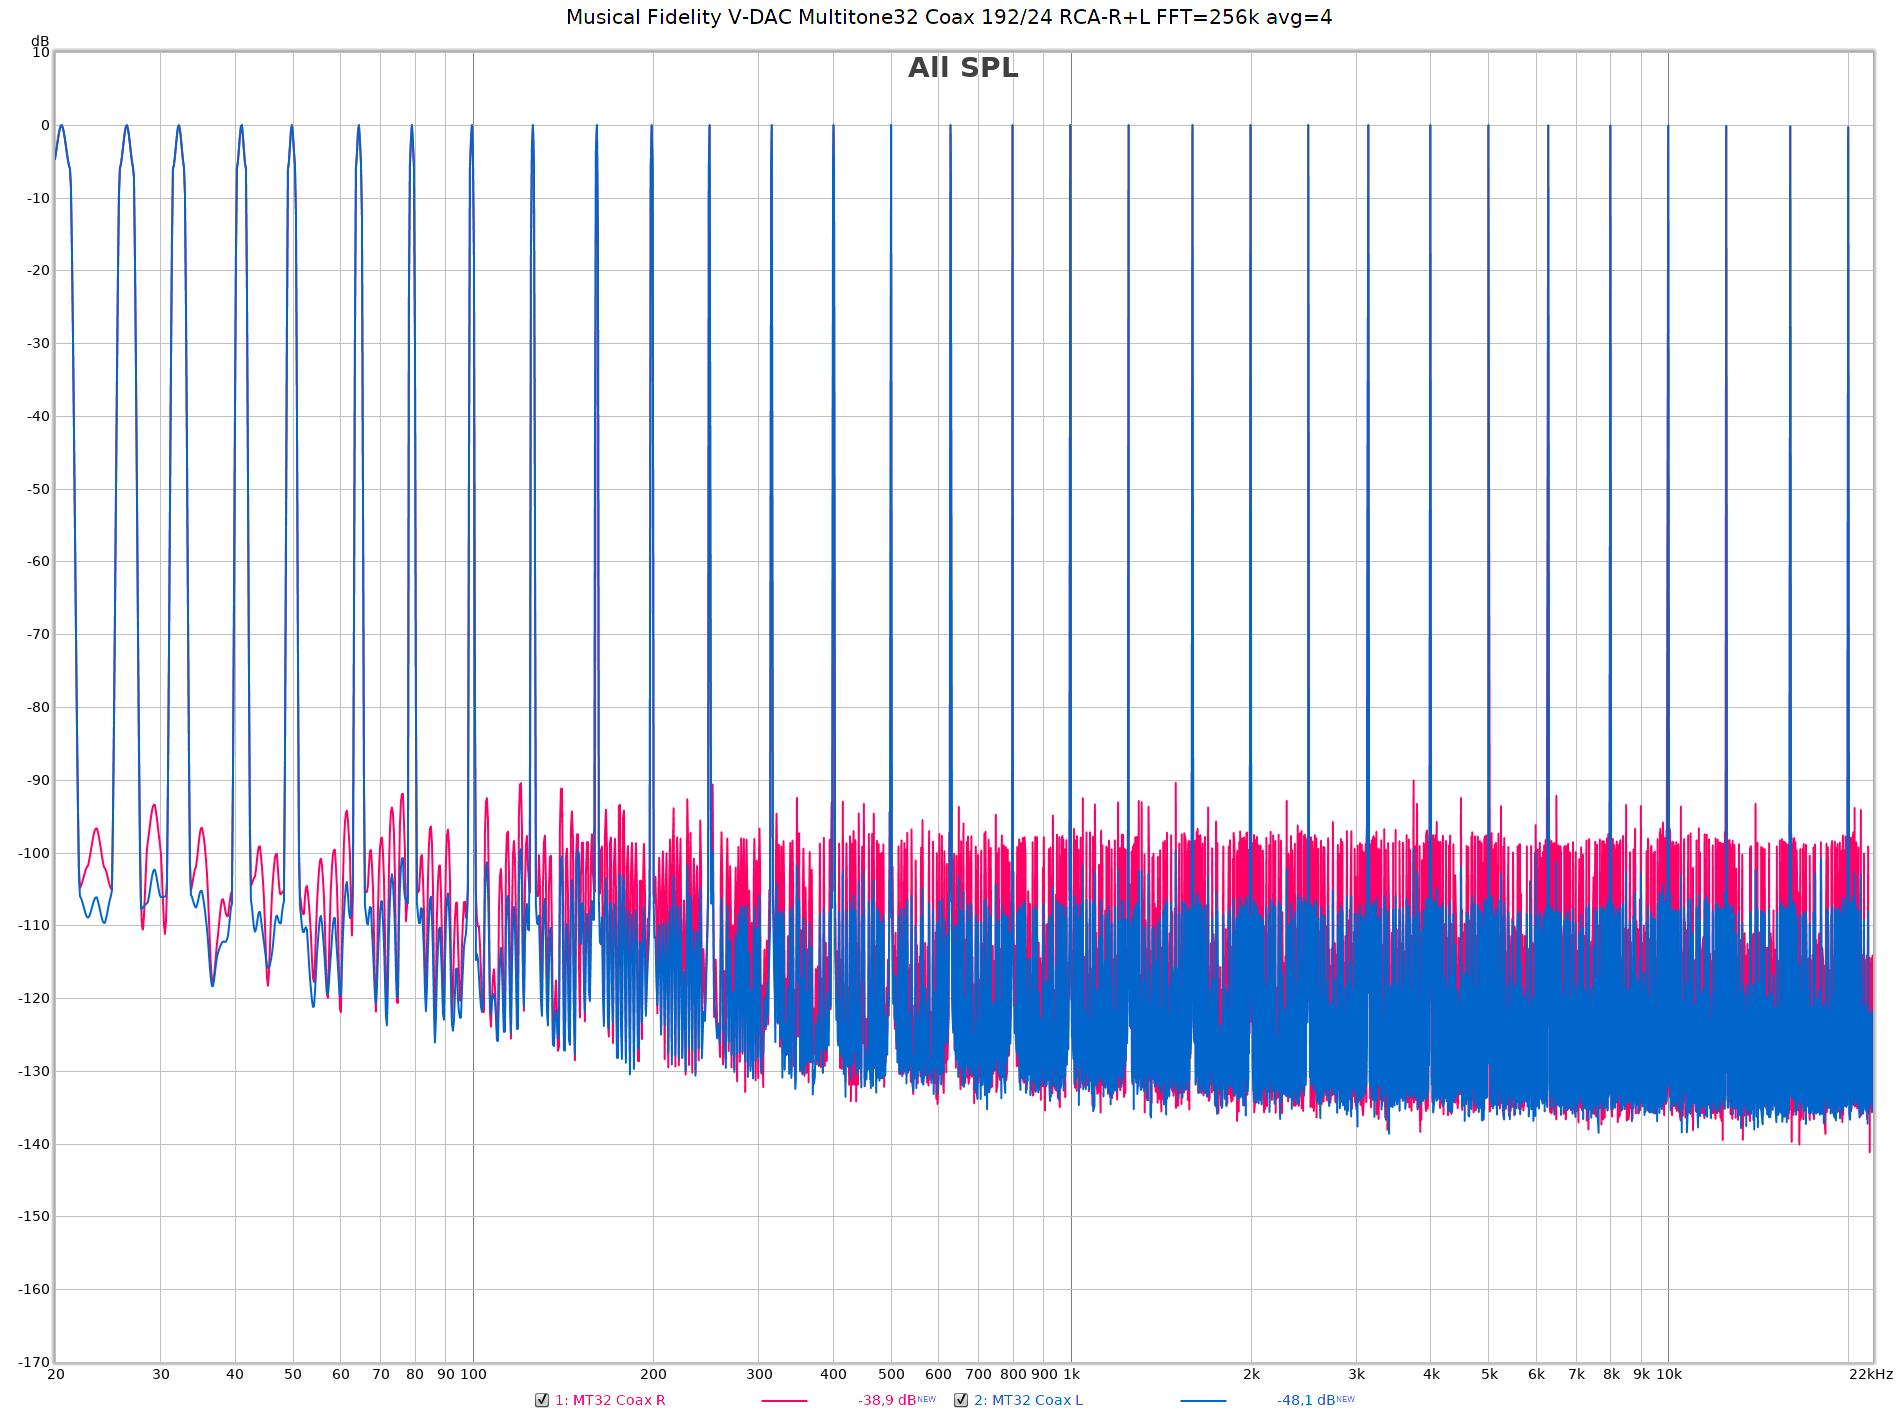 Musical Fidelity V-DAC Multitone32 Coax 192-24 RCA-R+L FFT=256k avg=8.png